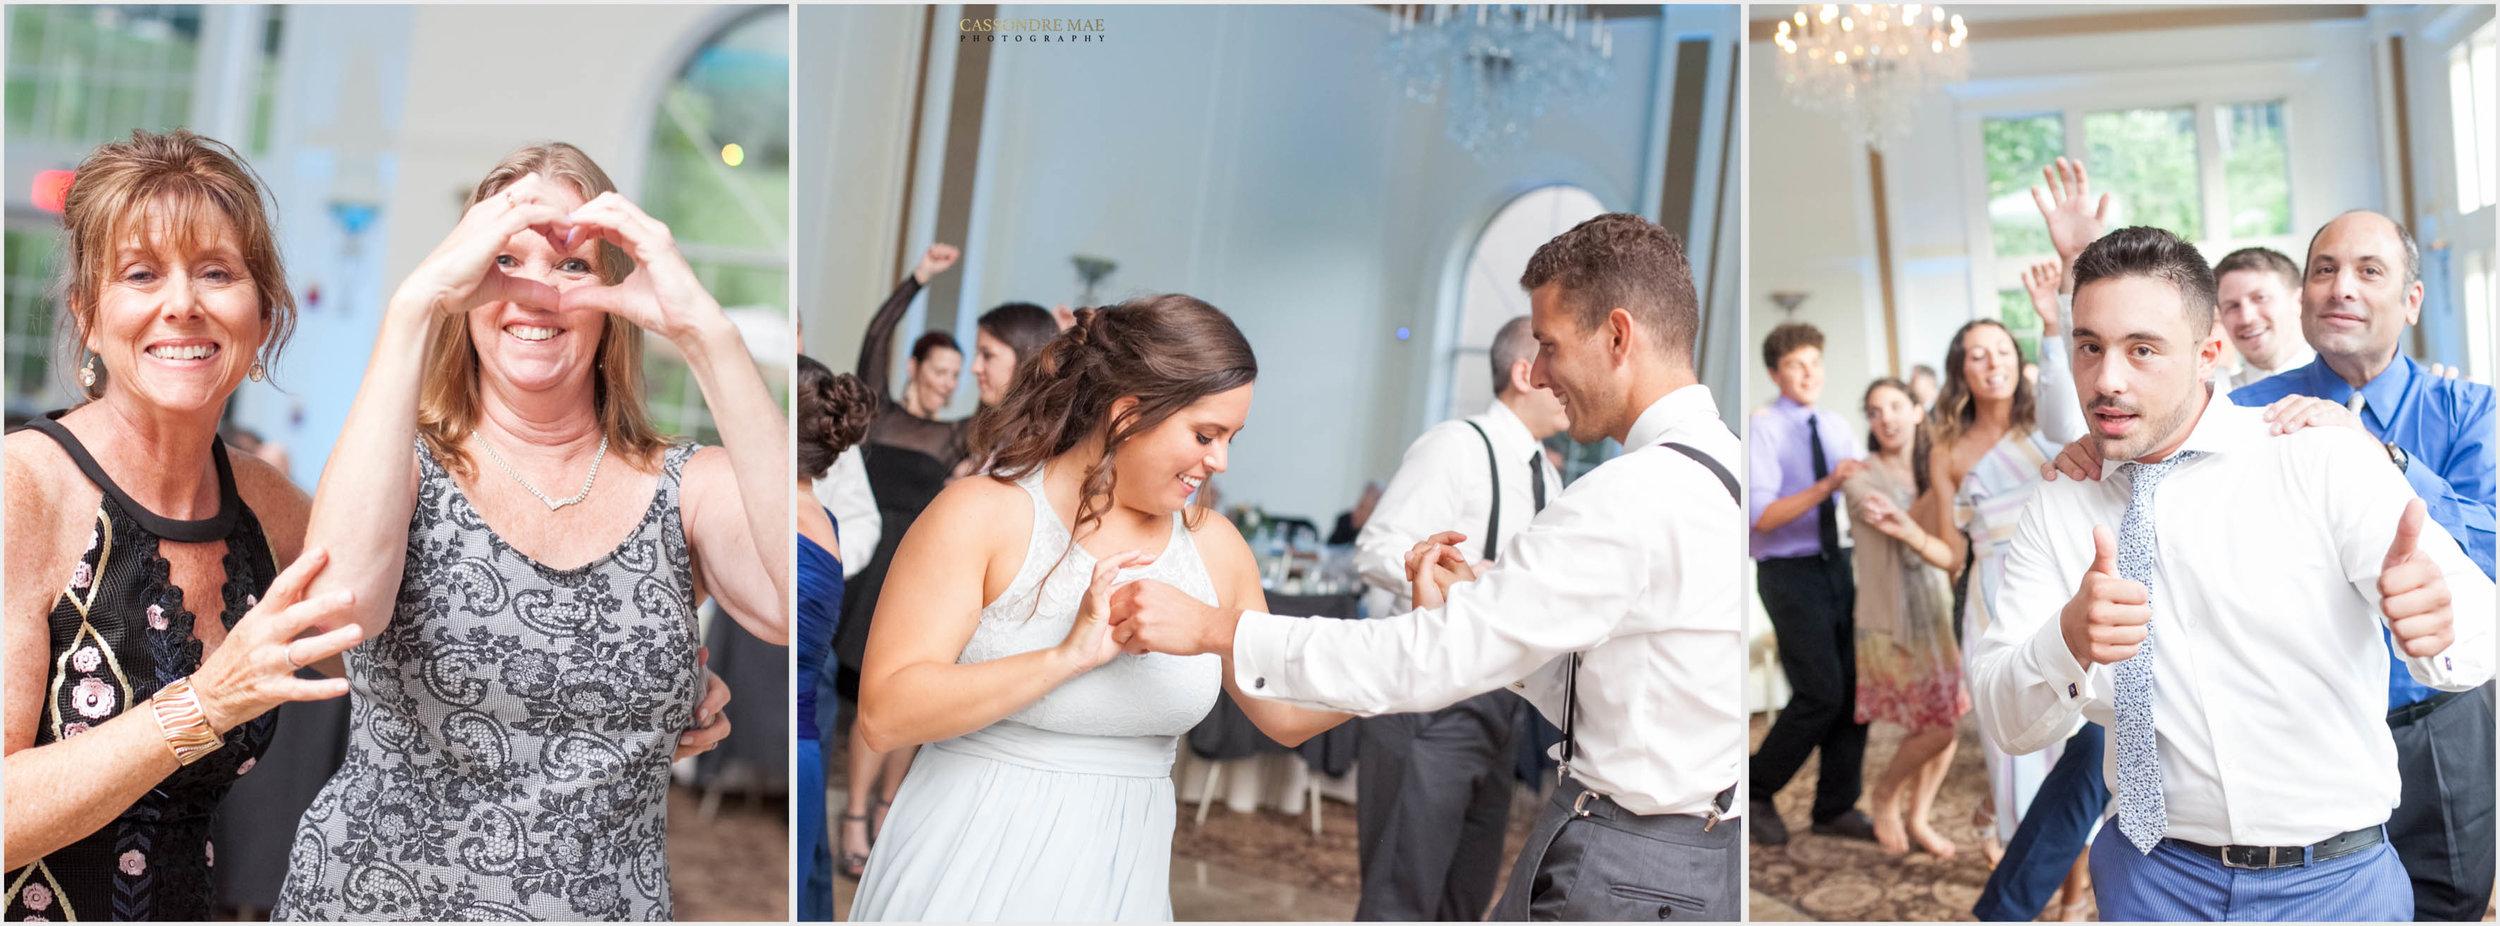 Cassondre Mae Photography Hudson Valley NY Wedding Photographer -35.jpg